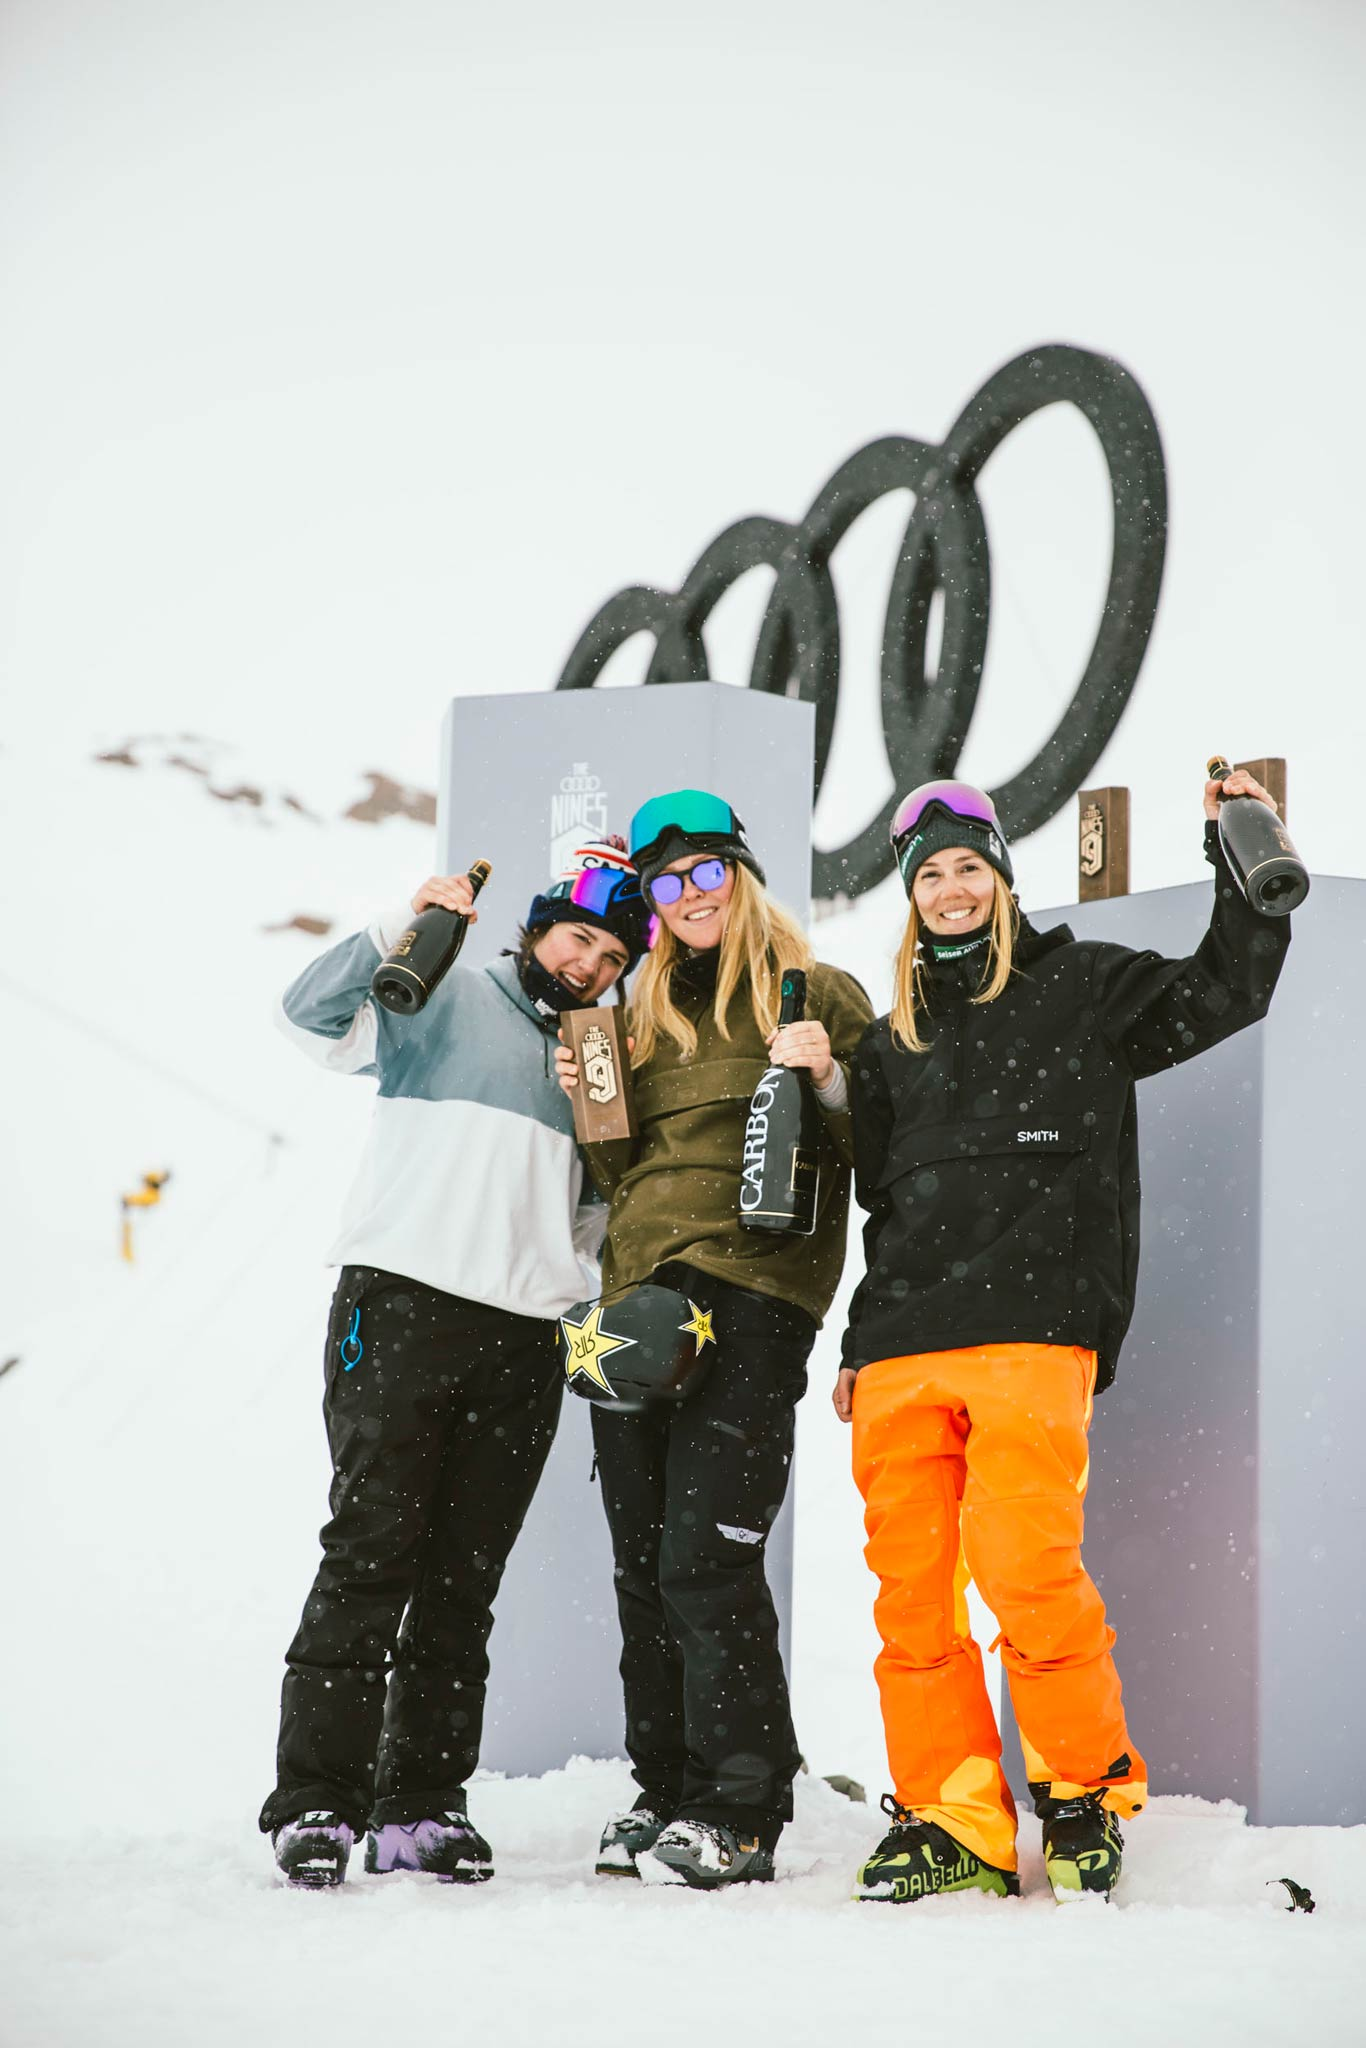 Die Gewinnerinnen bei den Frauen: Elena Gaskell, Johanne Killi & SIlvia Bertagna (v.l.n.r.) - Foto: David Malacrida